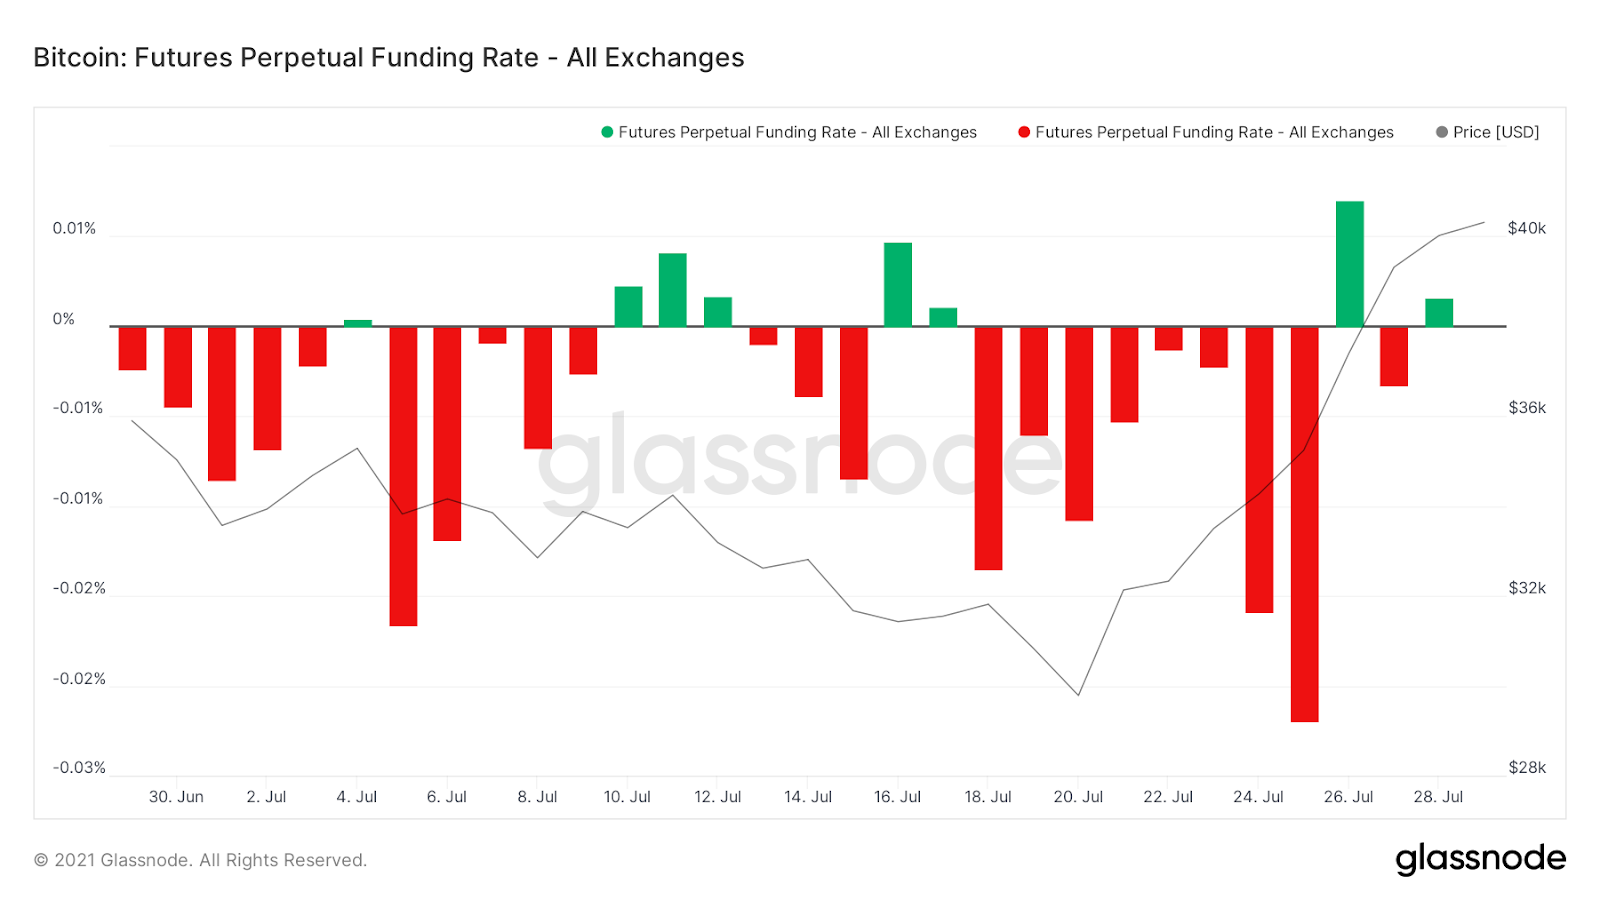 Glassnode funding rates